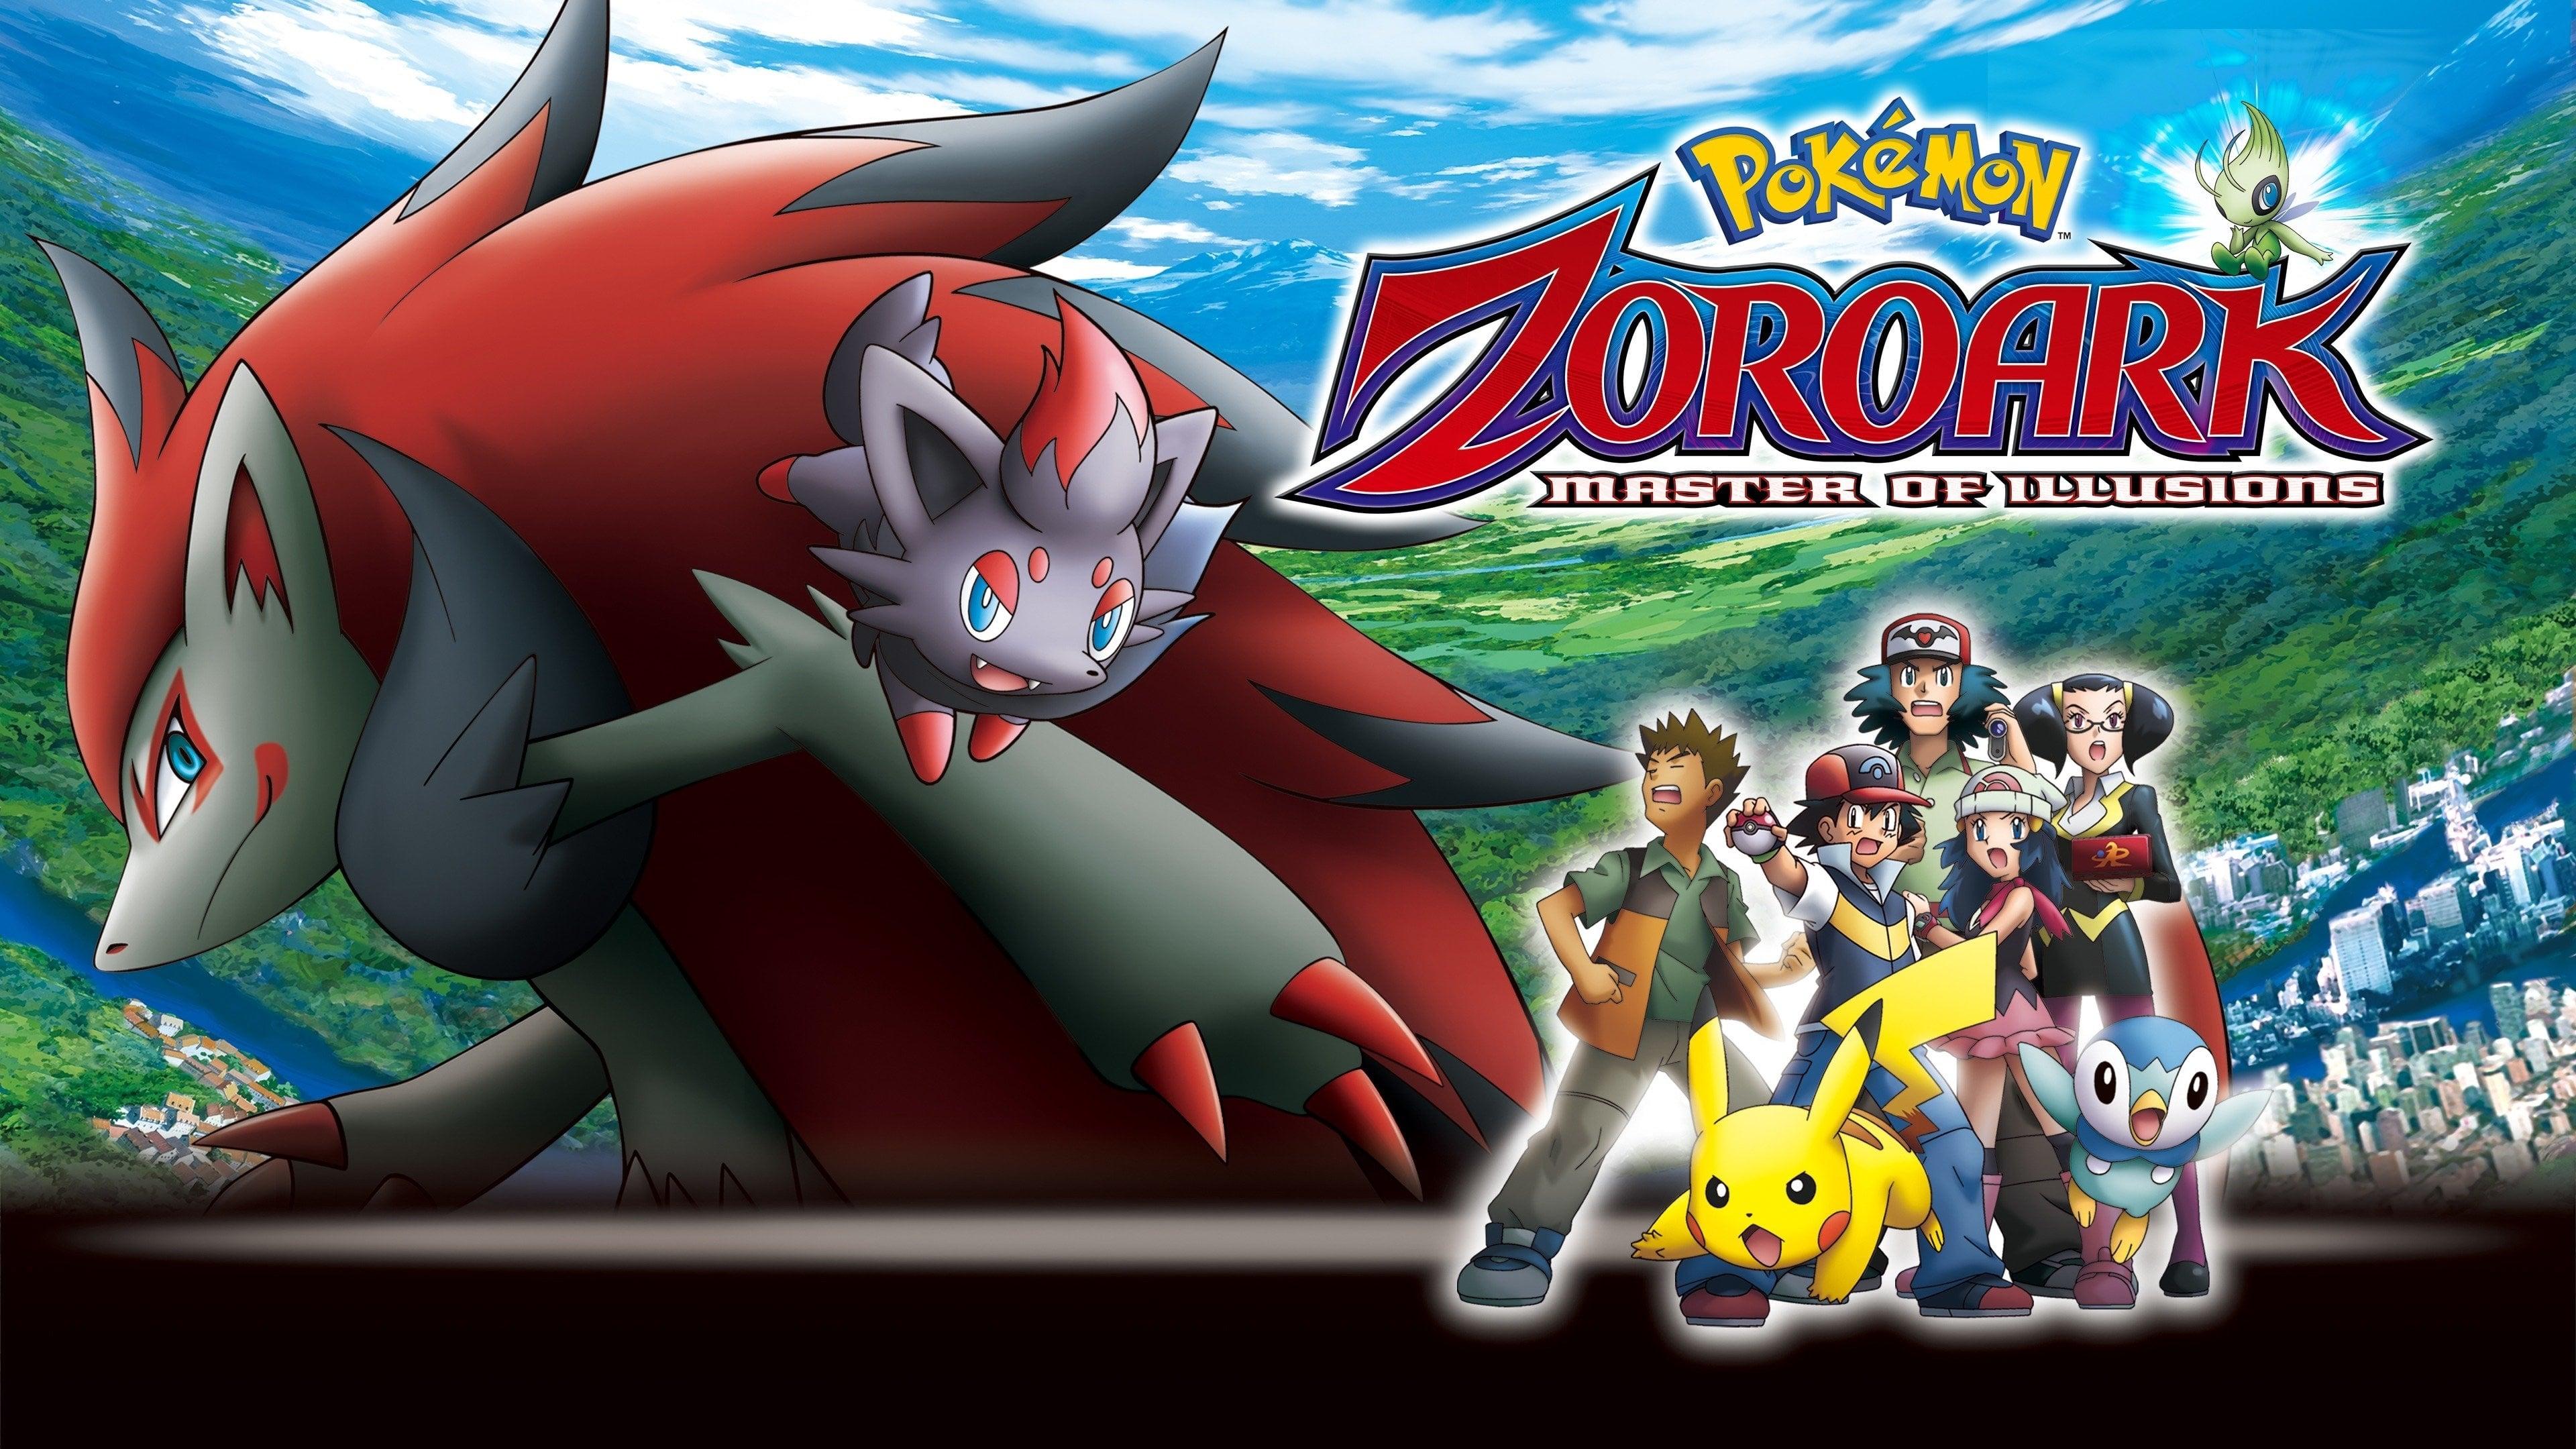 Watch Pokemon Zoroark Master Of Illusions 2010 Full Movie Online Free 123movies Watch Movies Online Free